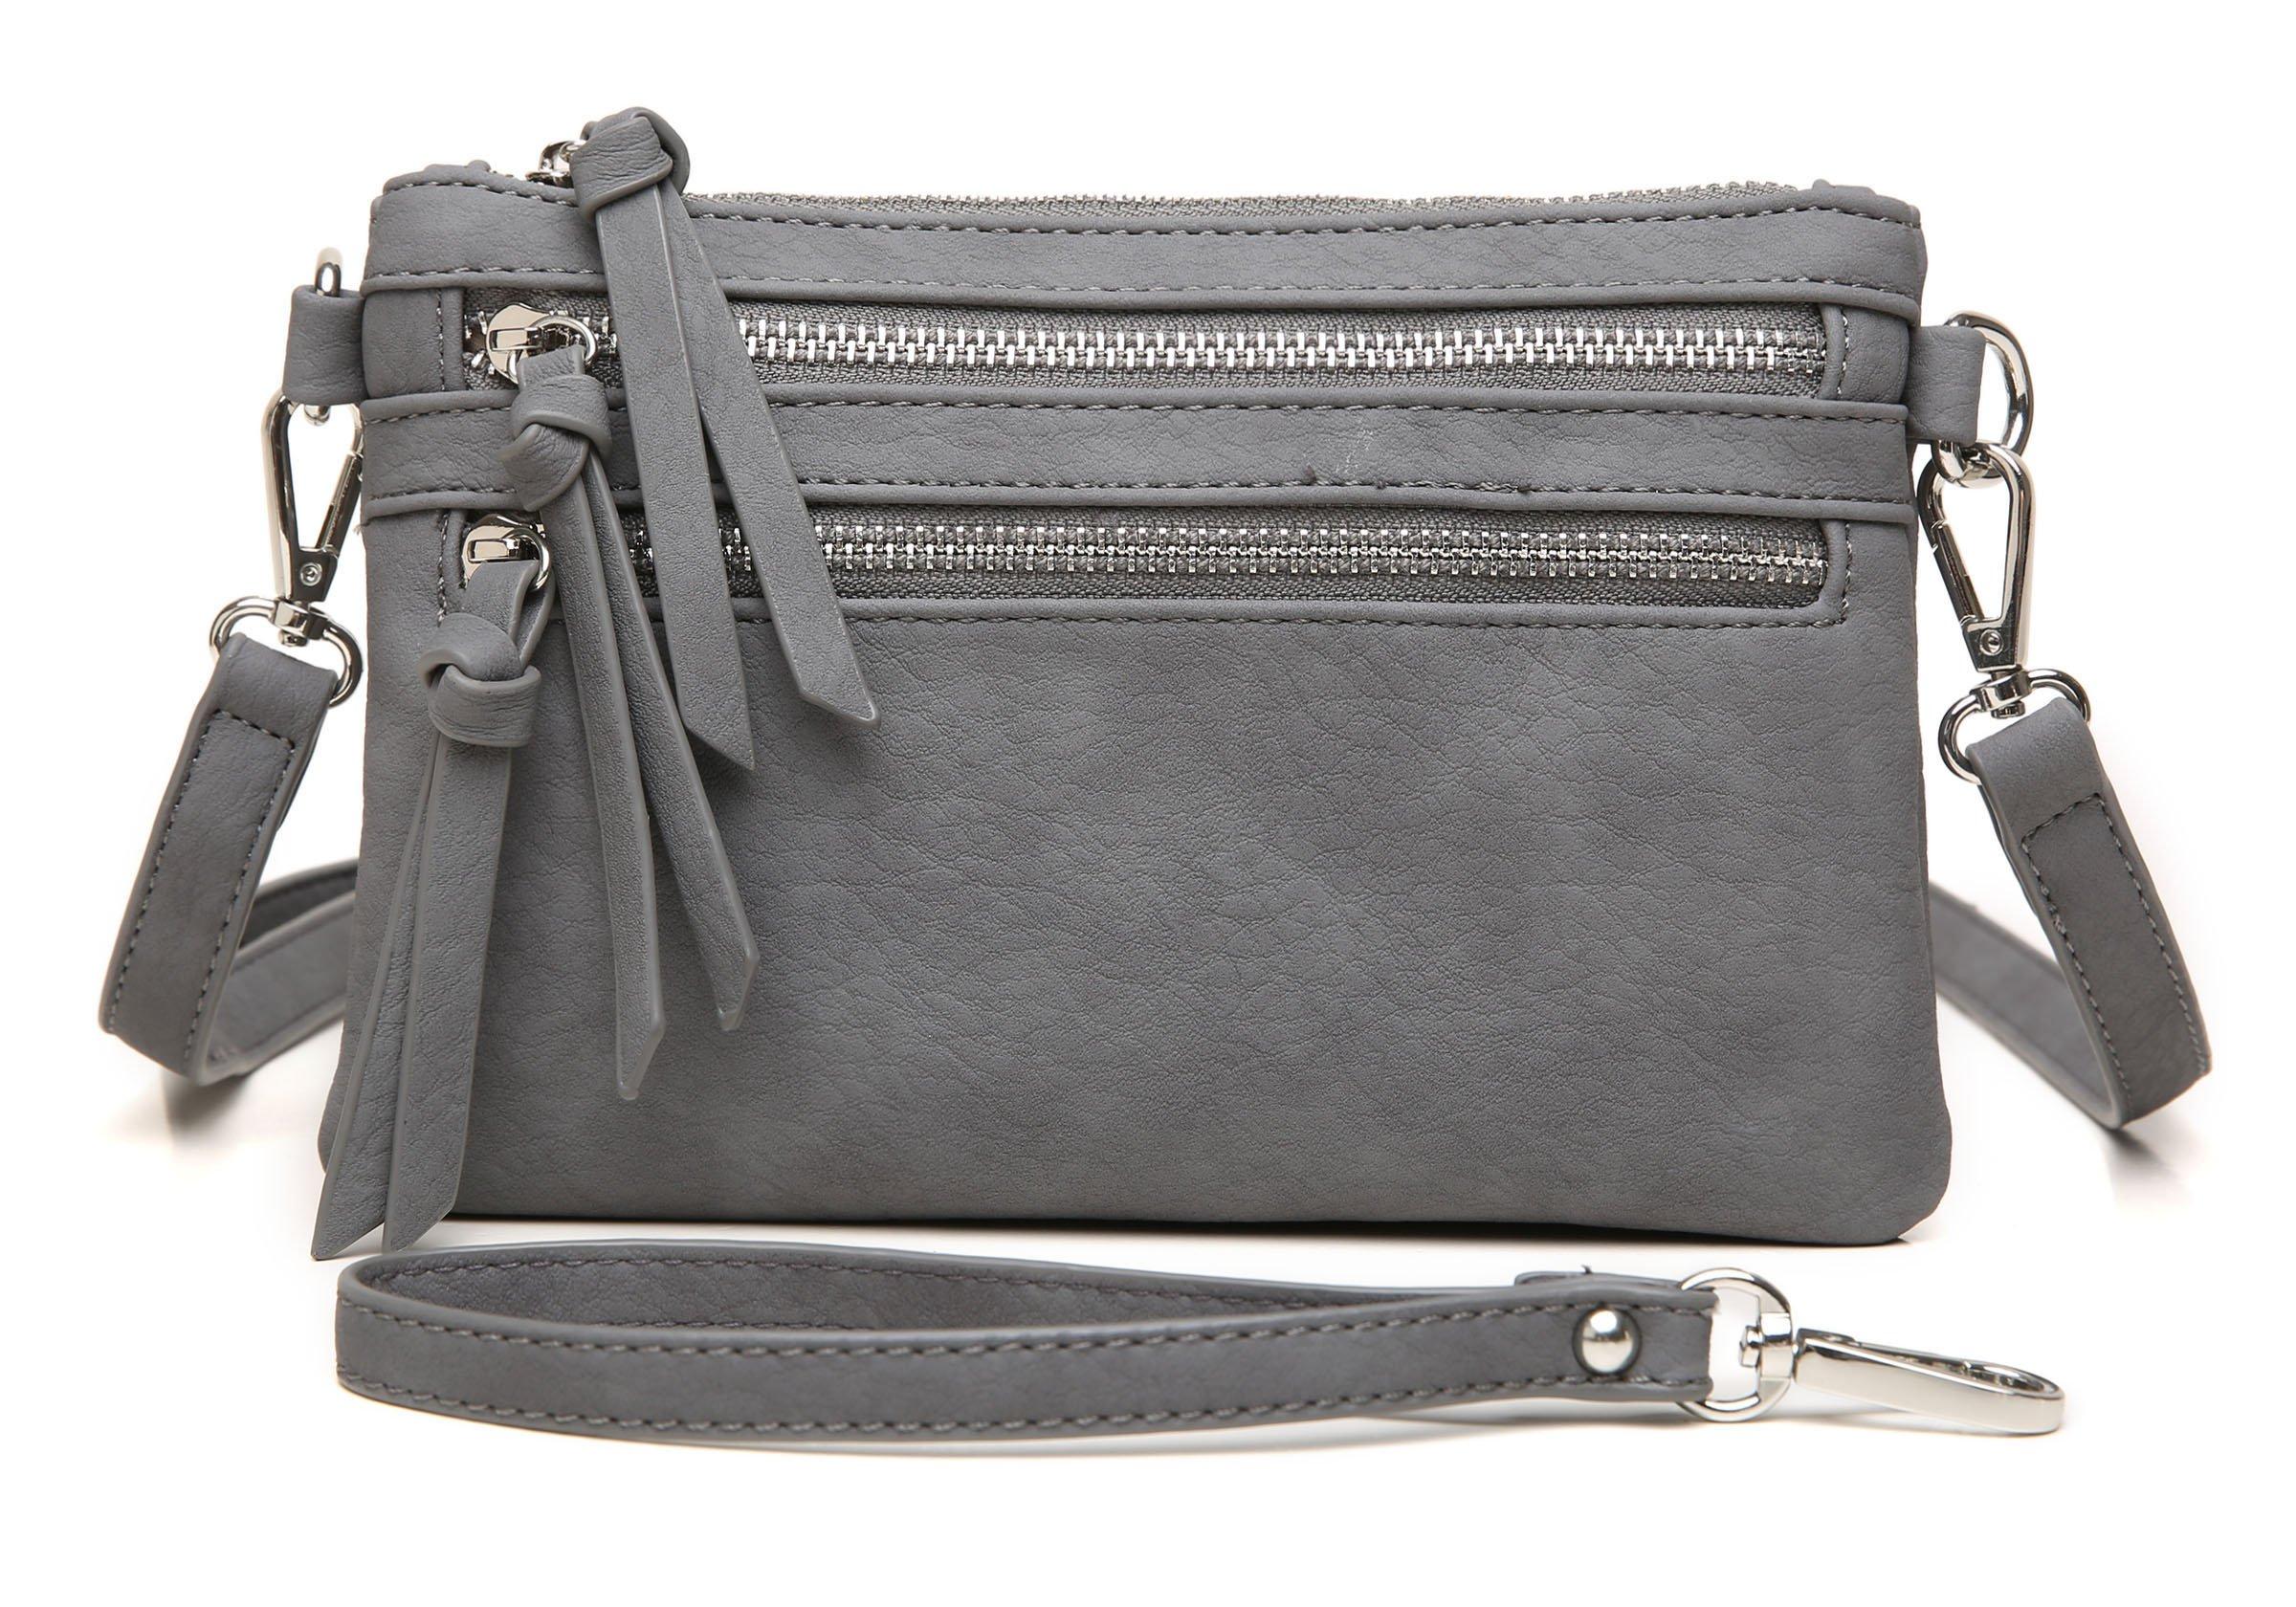 Aitbags Multi-Zipper Pocket Crossbody Handbag Lightweight Purse Functional Clutch with Wristlet by Aitbags (Image #1)